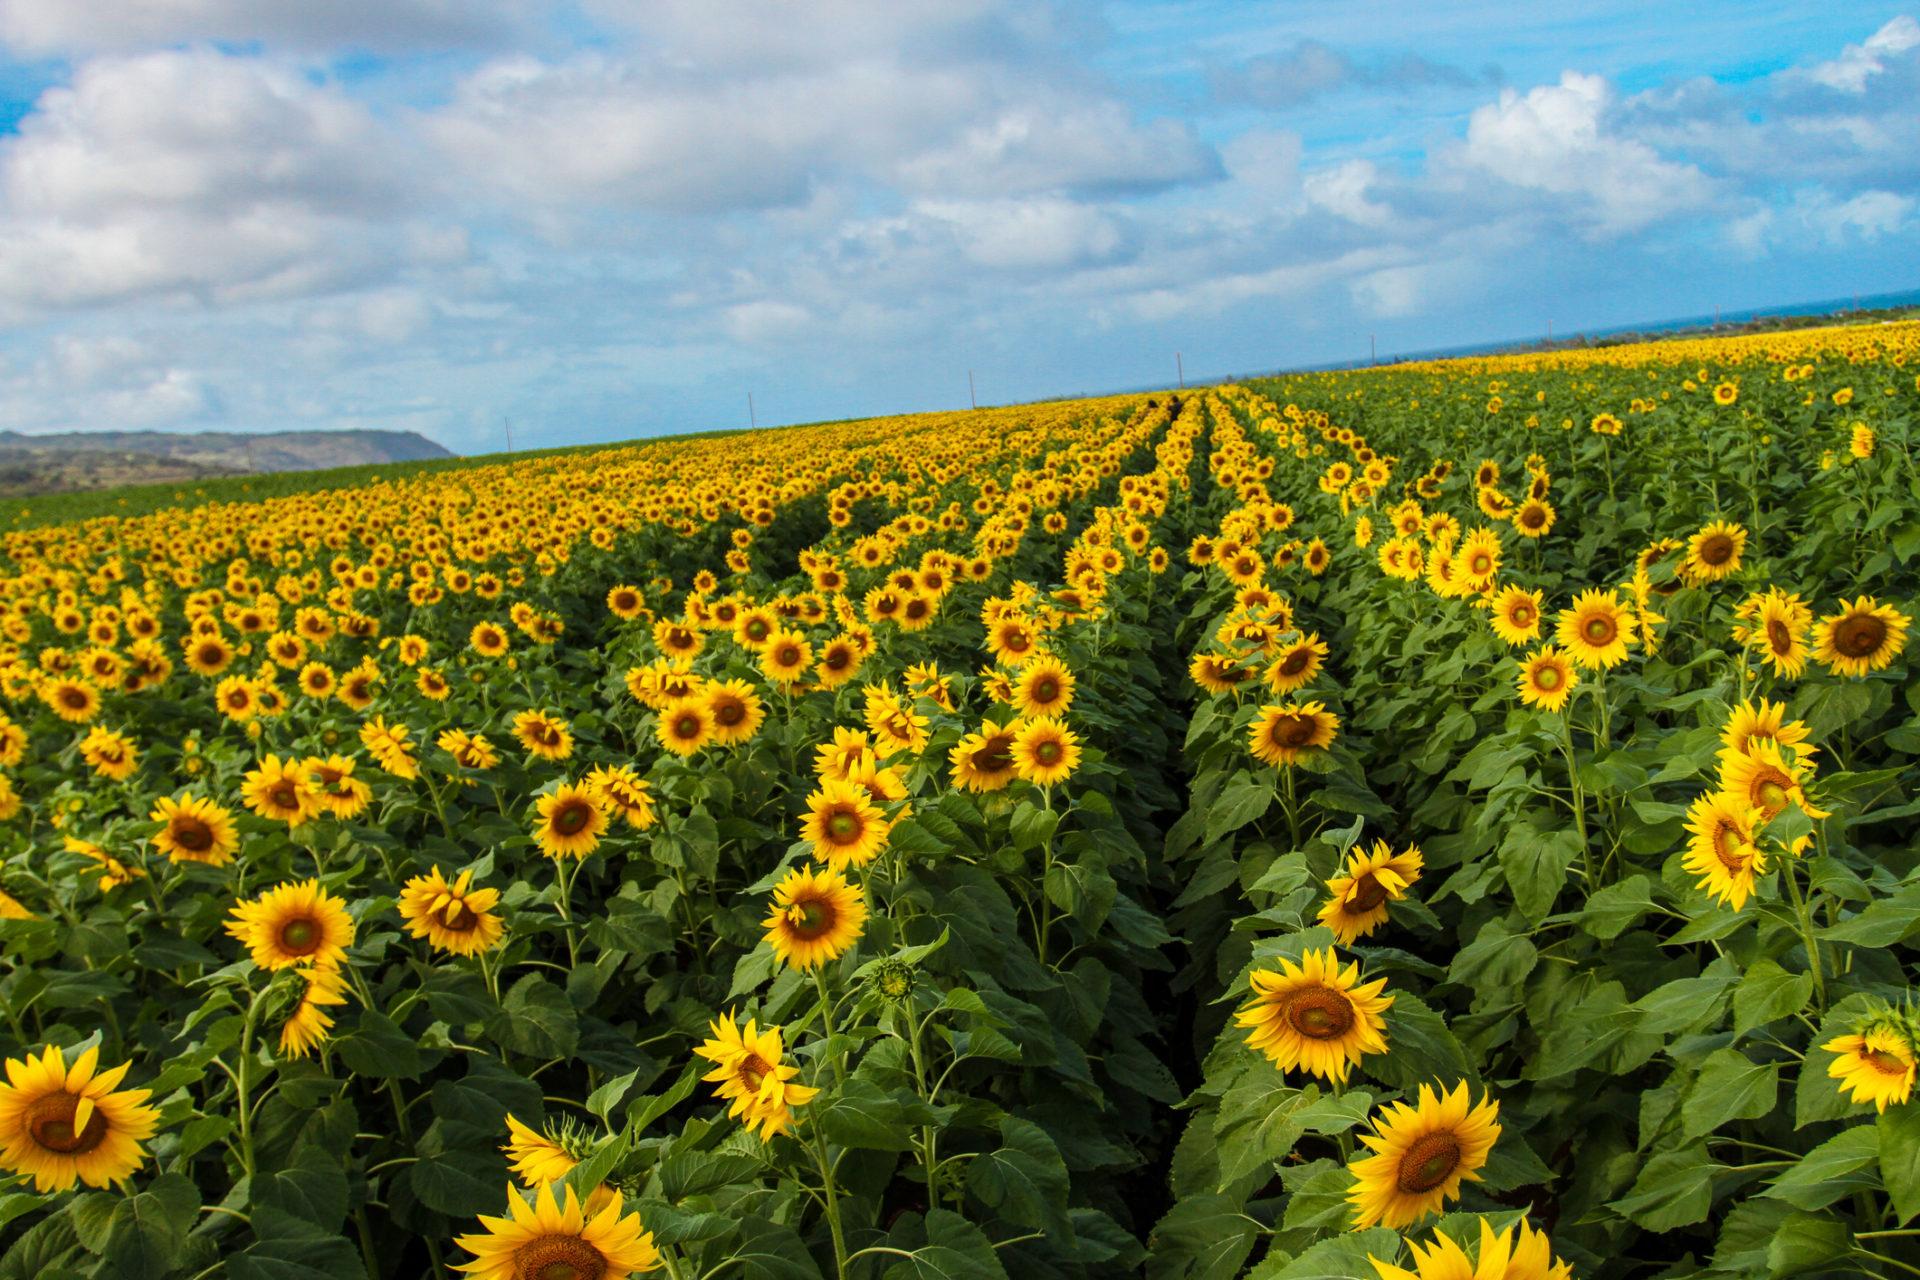 Sunflower Fields in Waialua on Oahu's North Shore - A Must See!